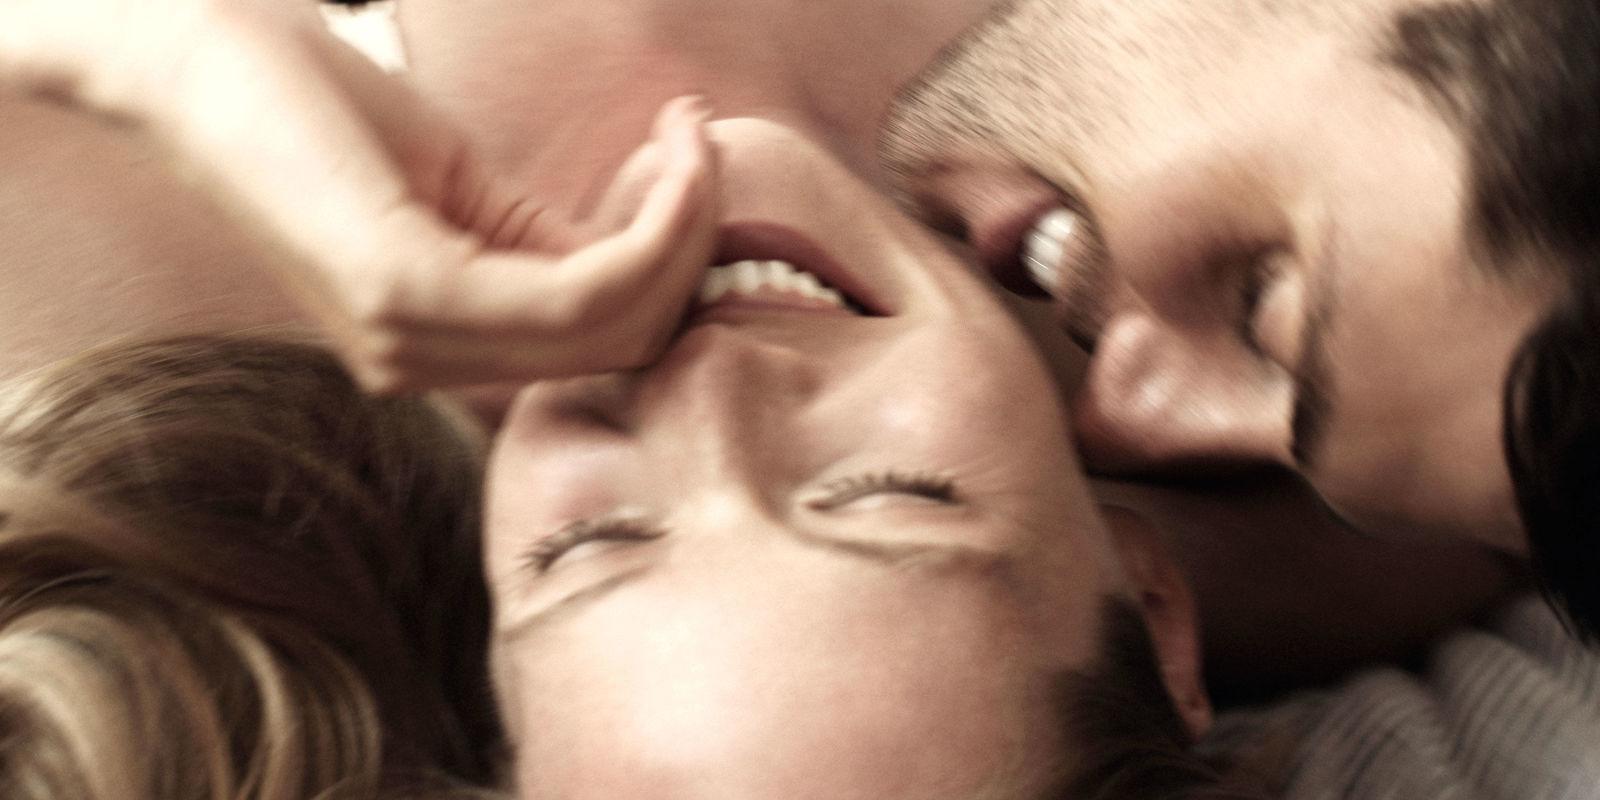 Interracial erotic images